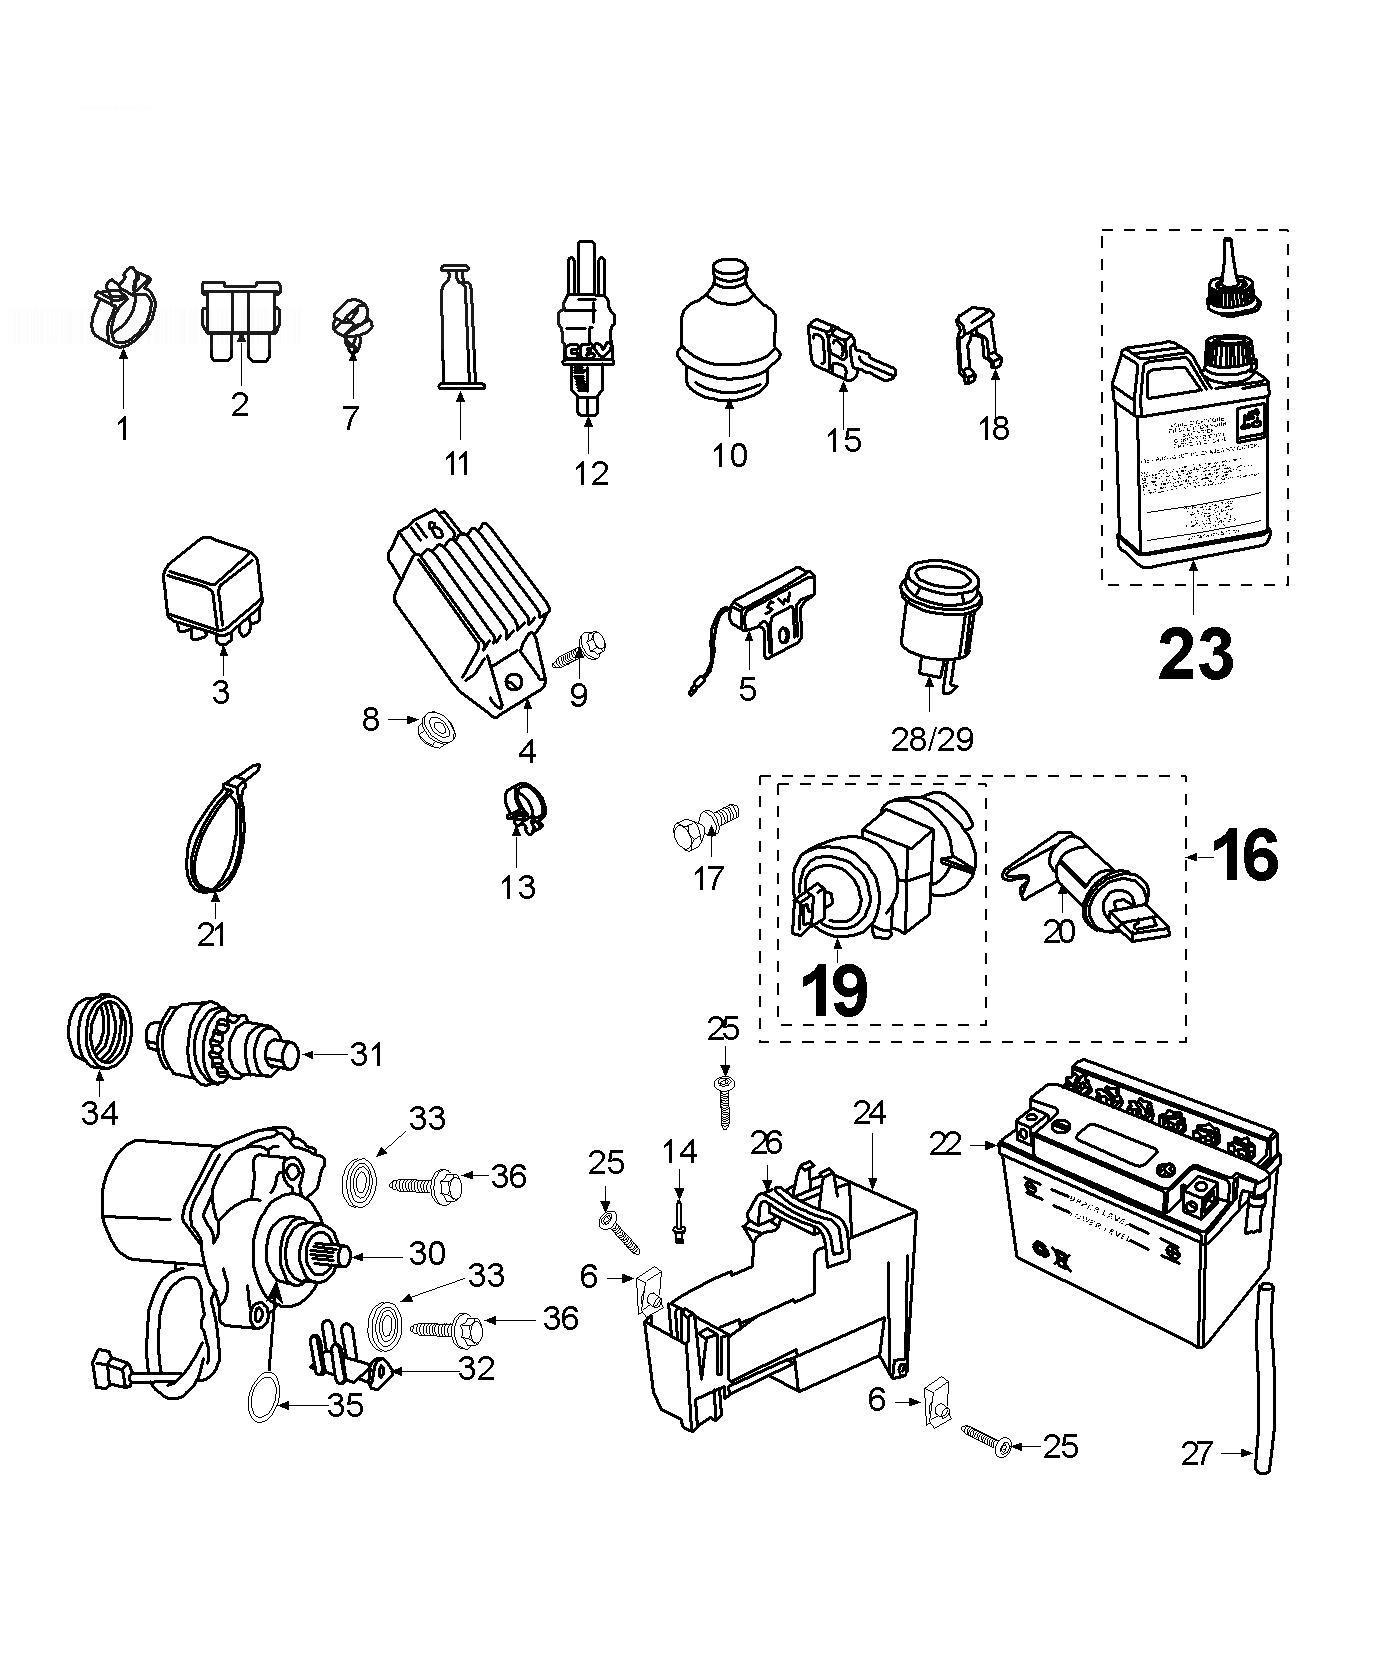 Peugeot Tkr Electric Equipment